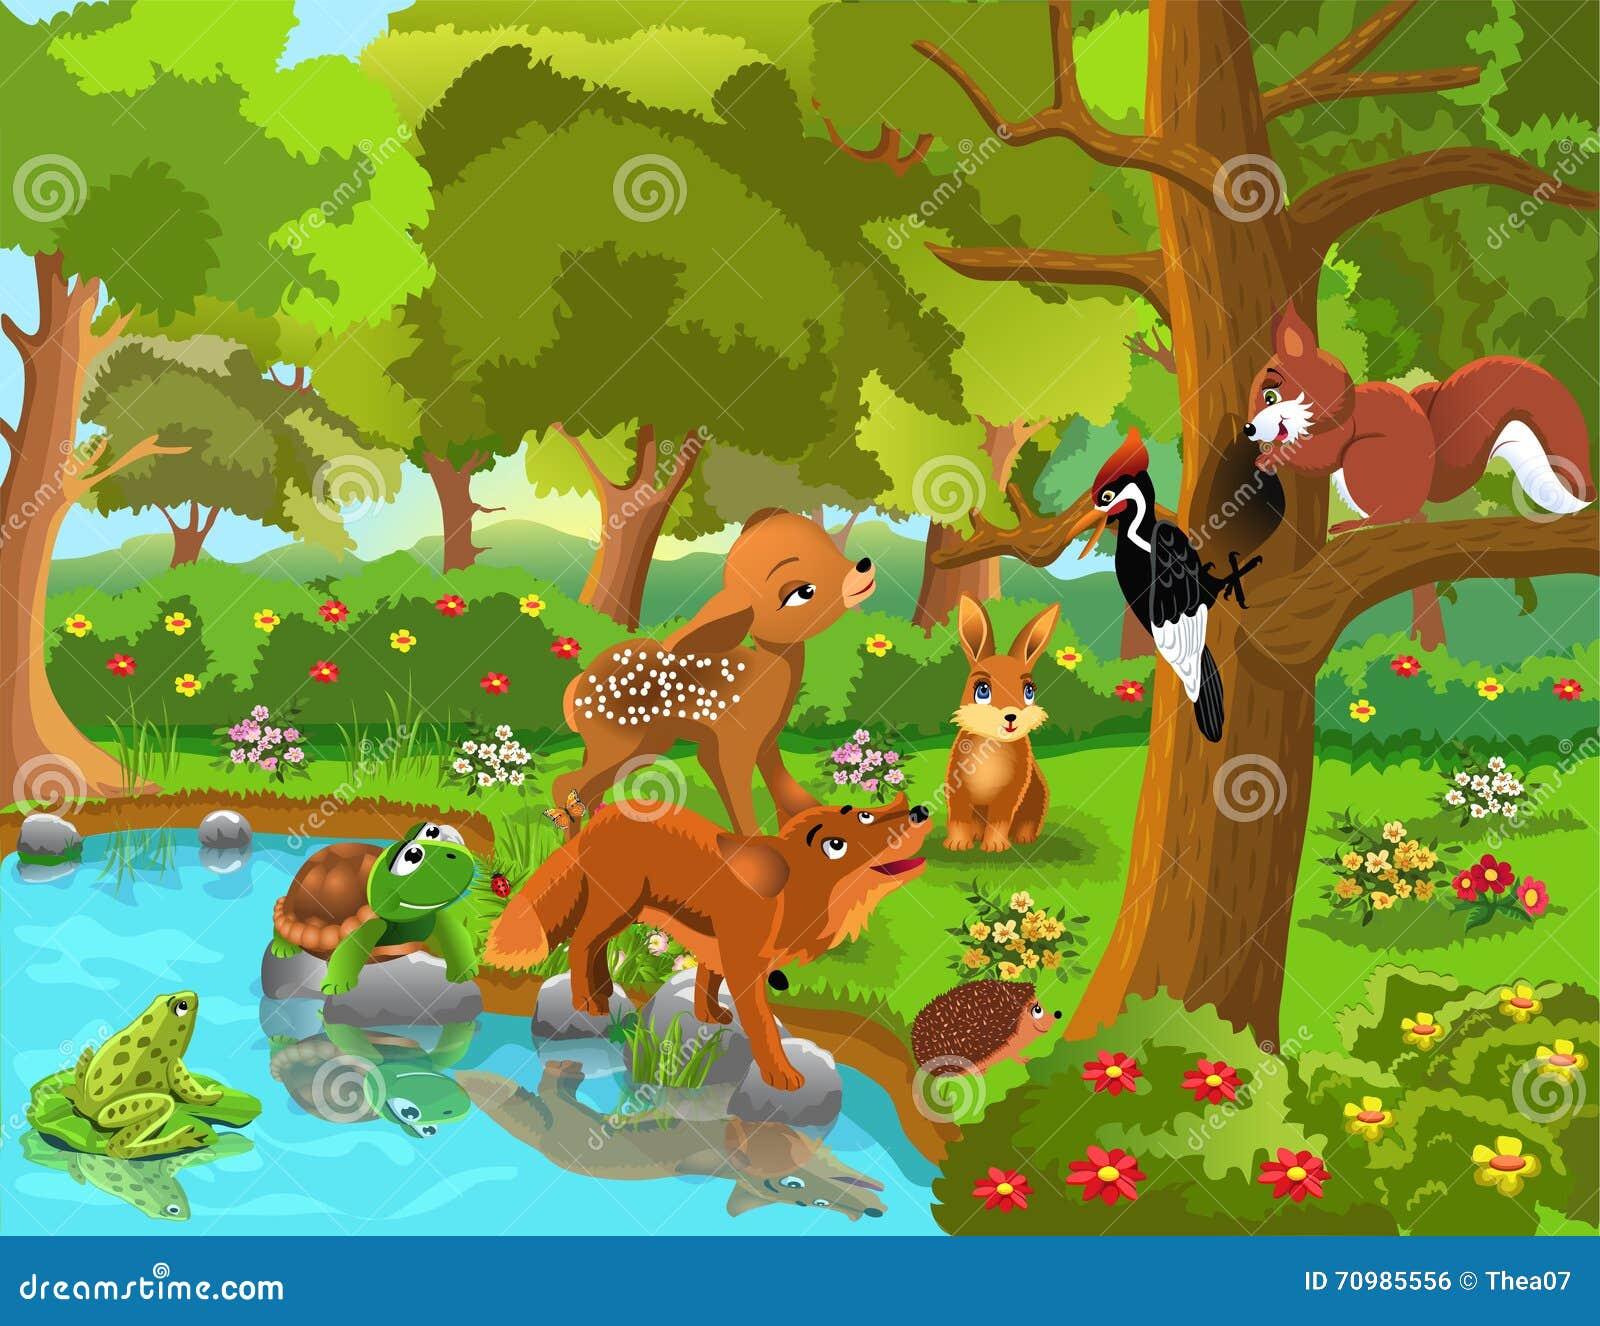 Marten Animal Wallpaper Graphic Design